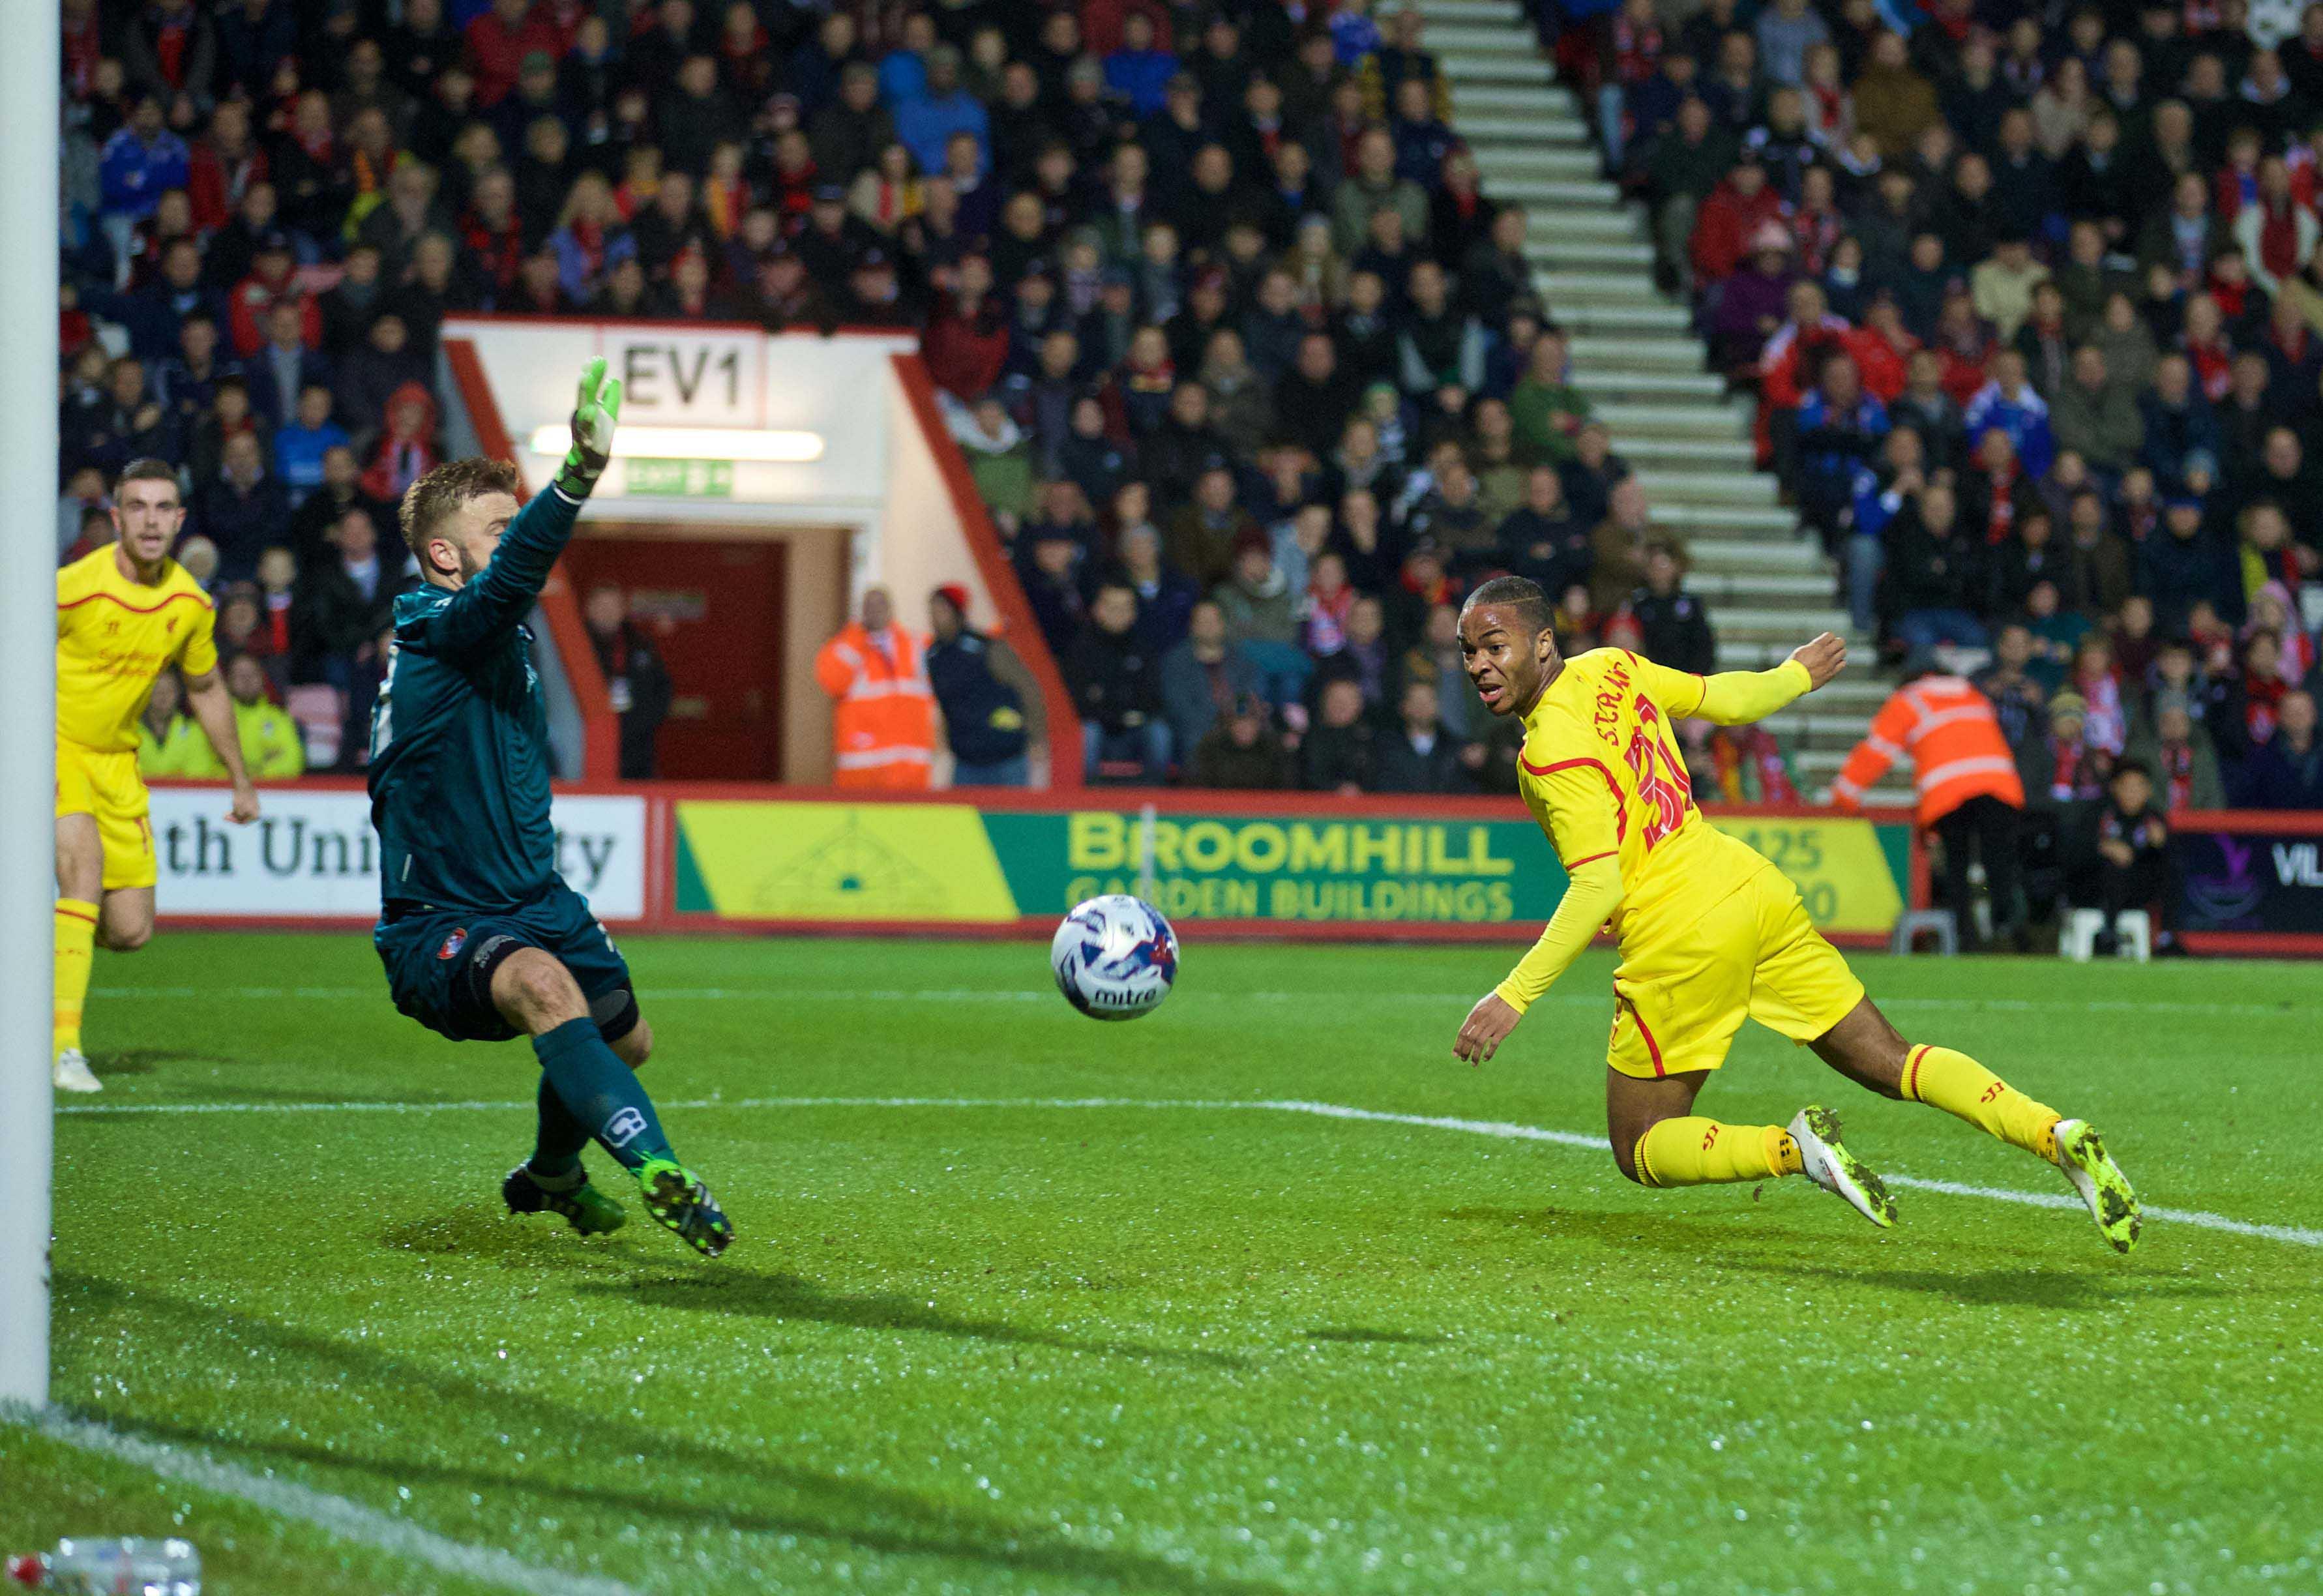 Football - Football League Cup - Quarter-Final - AFC Bournemouth v Liverpool FC